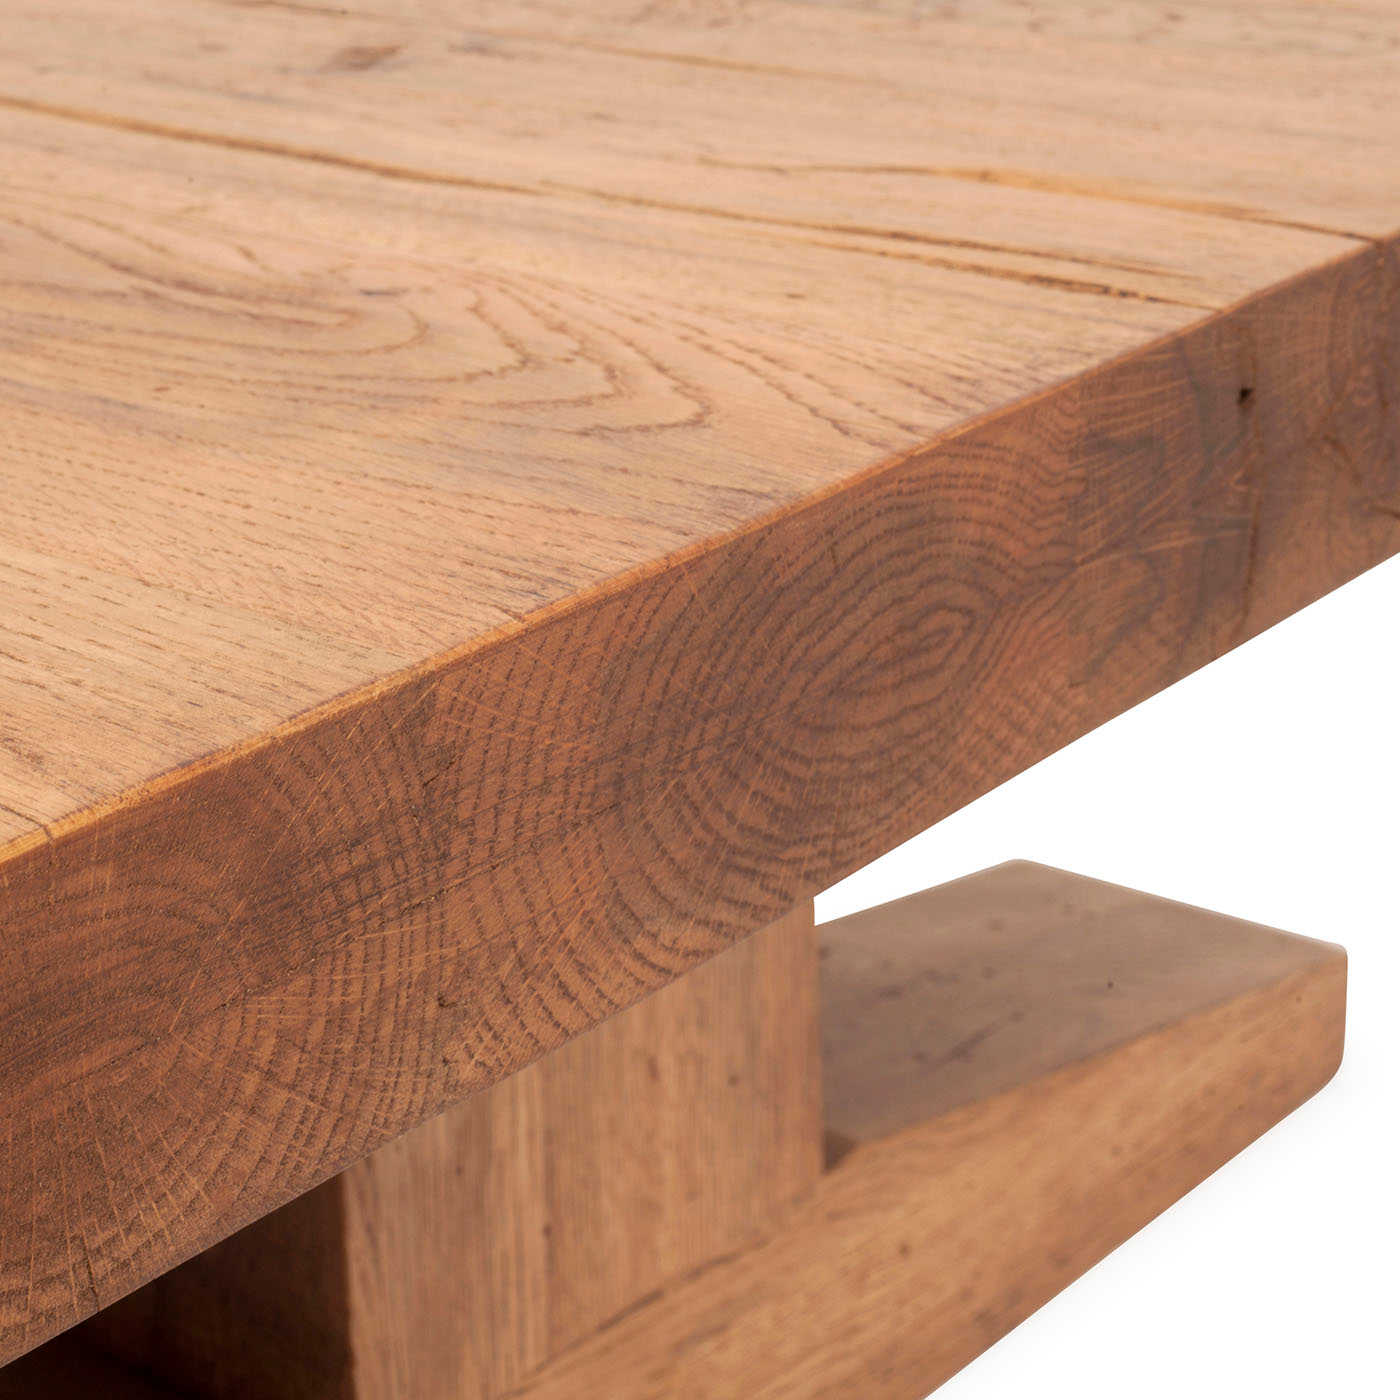 heal's tuscan coffee table